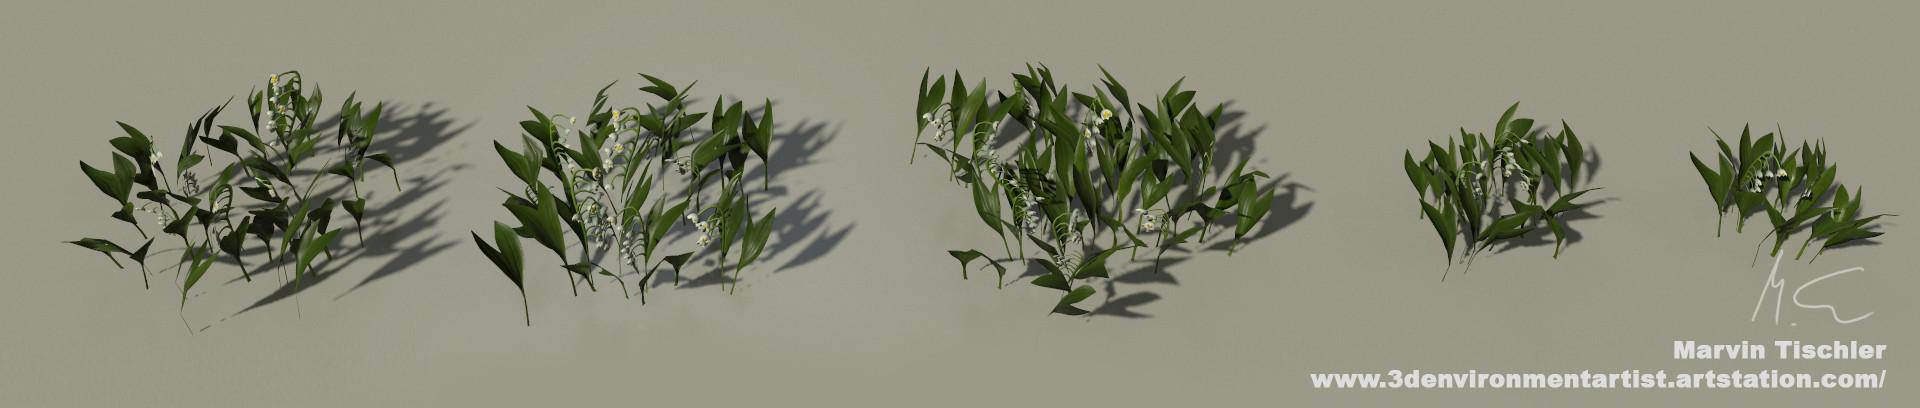 Marvin tischler plants 001 l